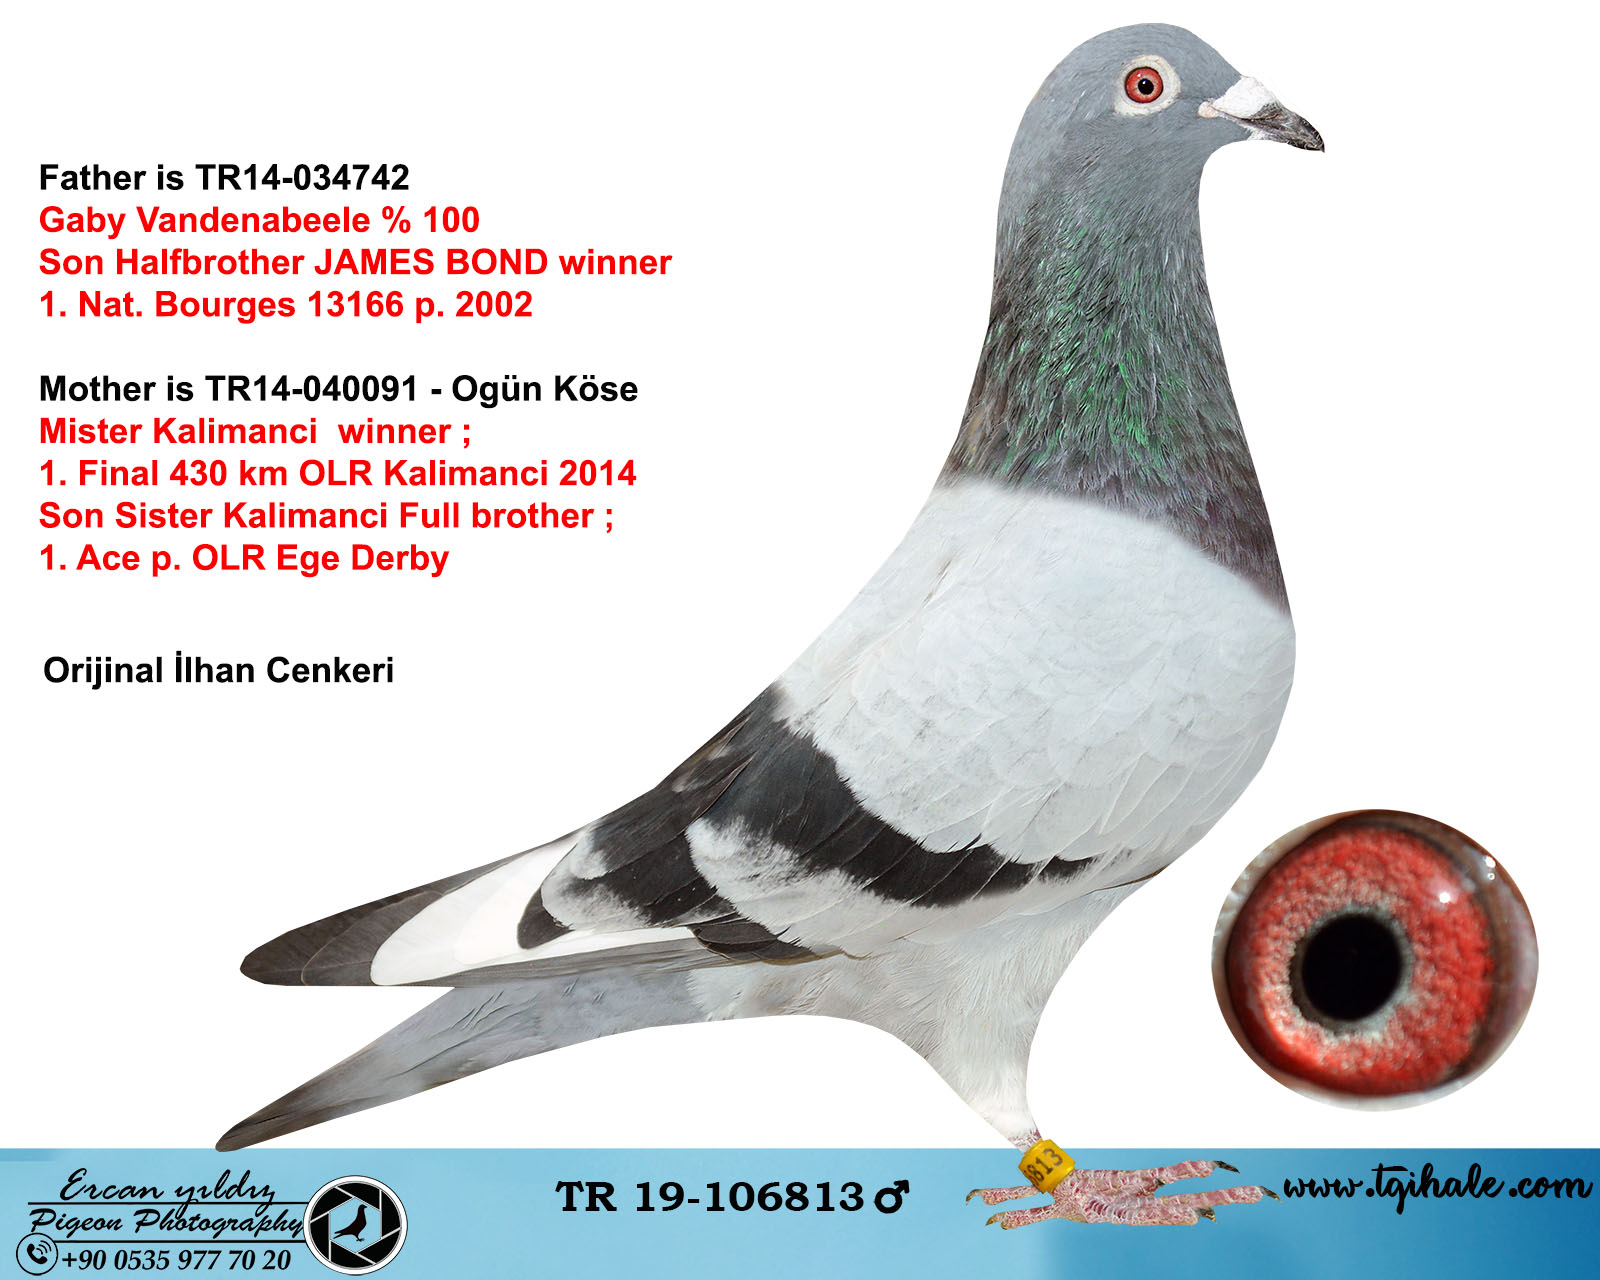 TR19-106813 ERKEK /  BABA GABY VANDENABEELE % 100 ANNE MISTER KALİMANCİ KARDEŞİ